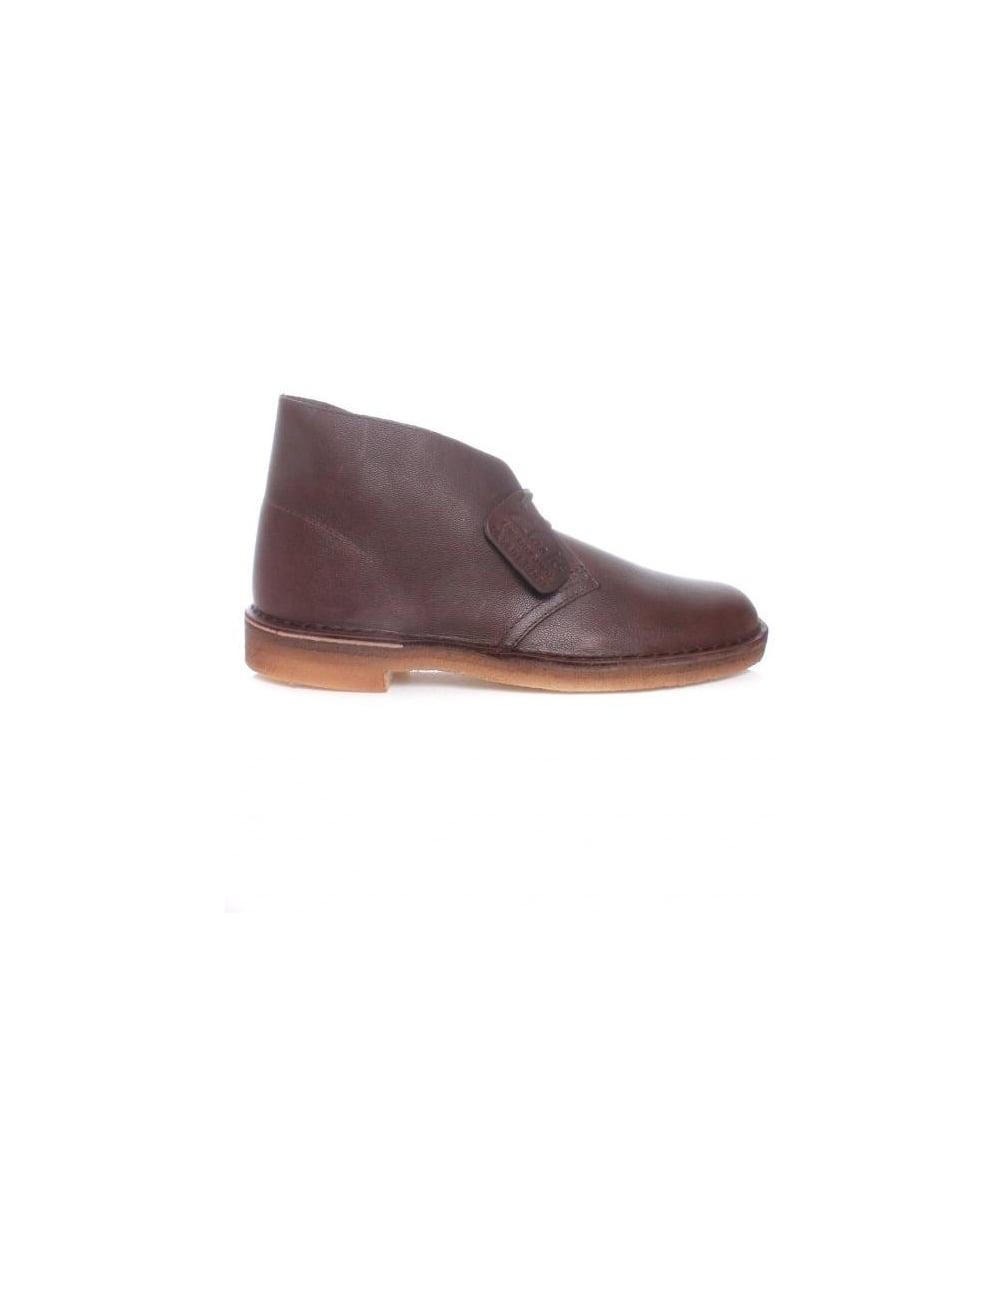 Clarks desert boot ebony vintage